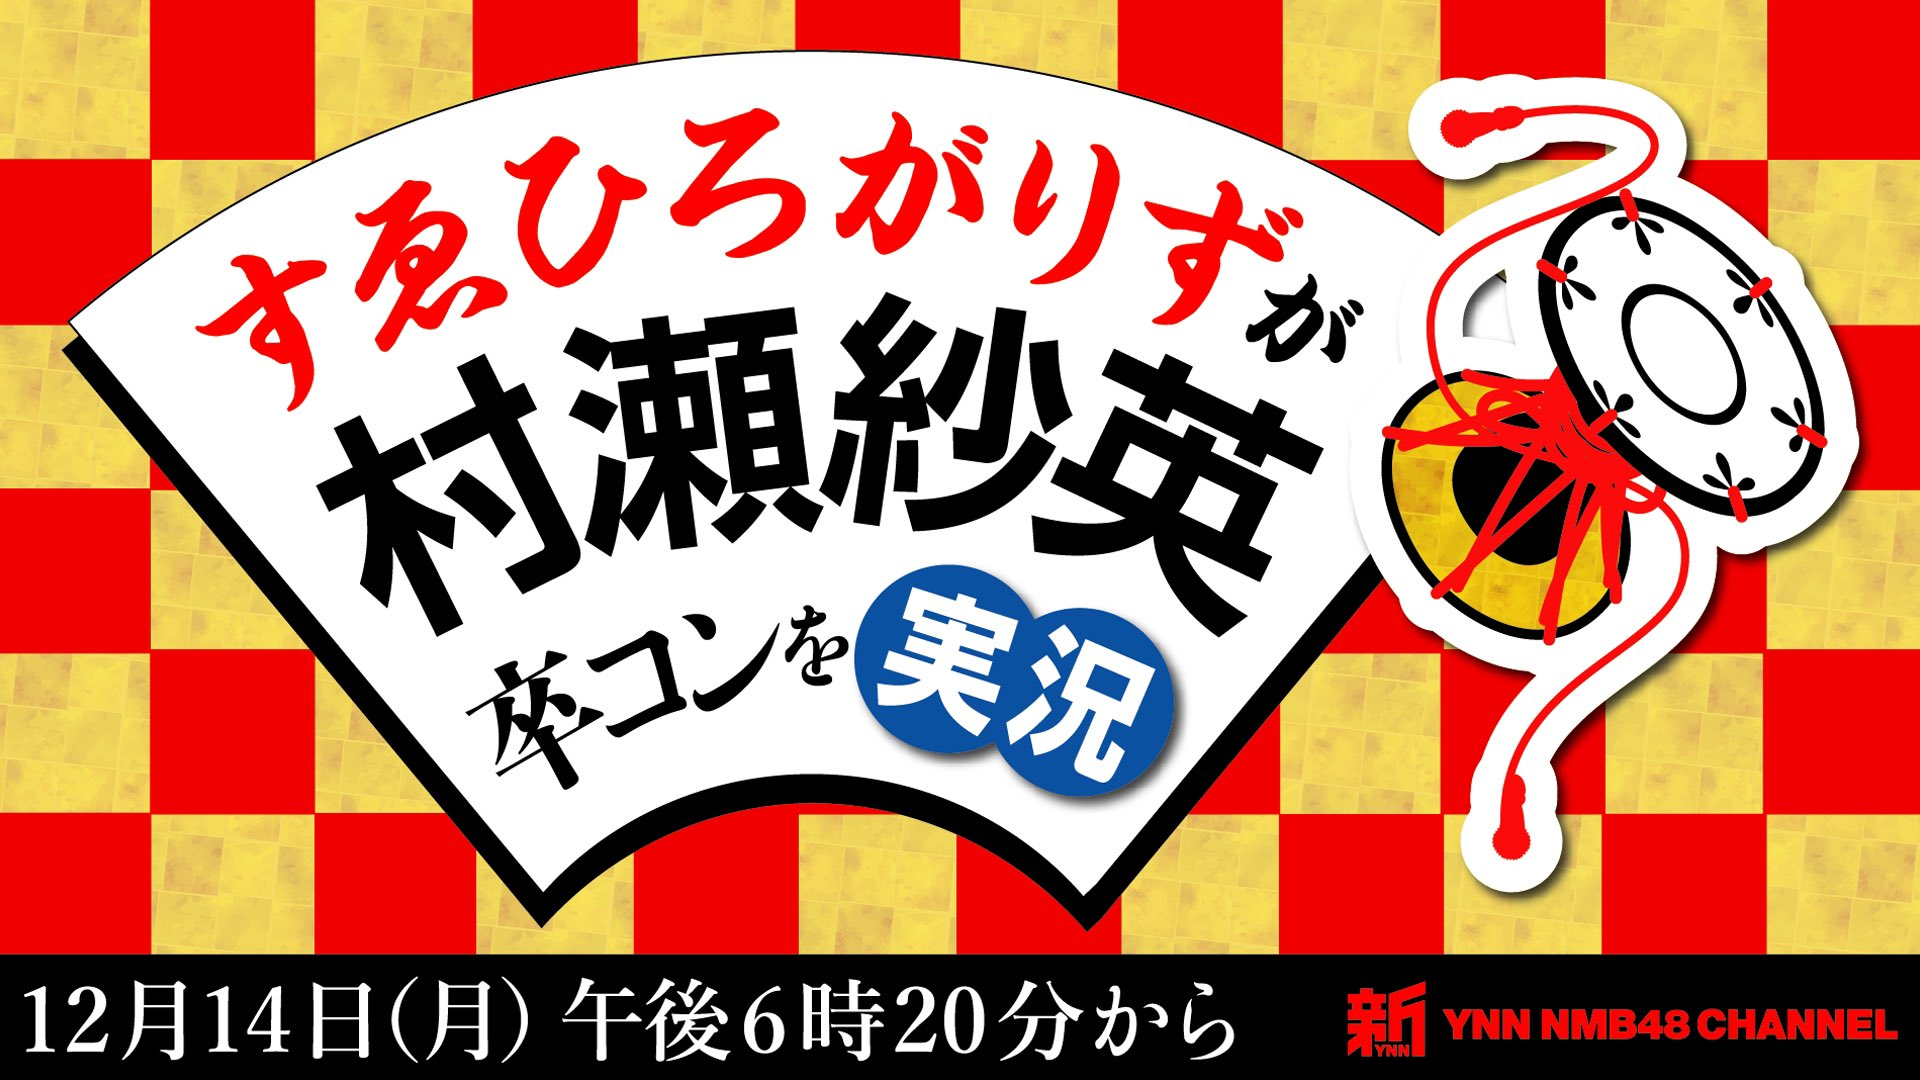 【NMB48】12/14にYNNで「すゑひろがりずが村瀬紗英卒コンを実況」の生配信が決定